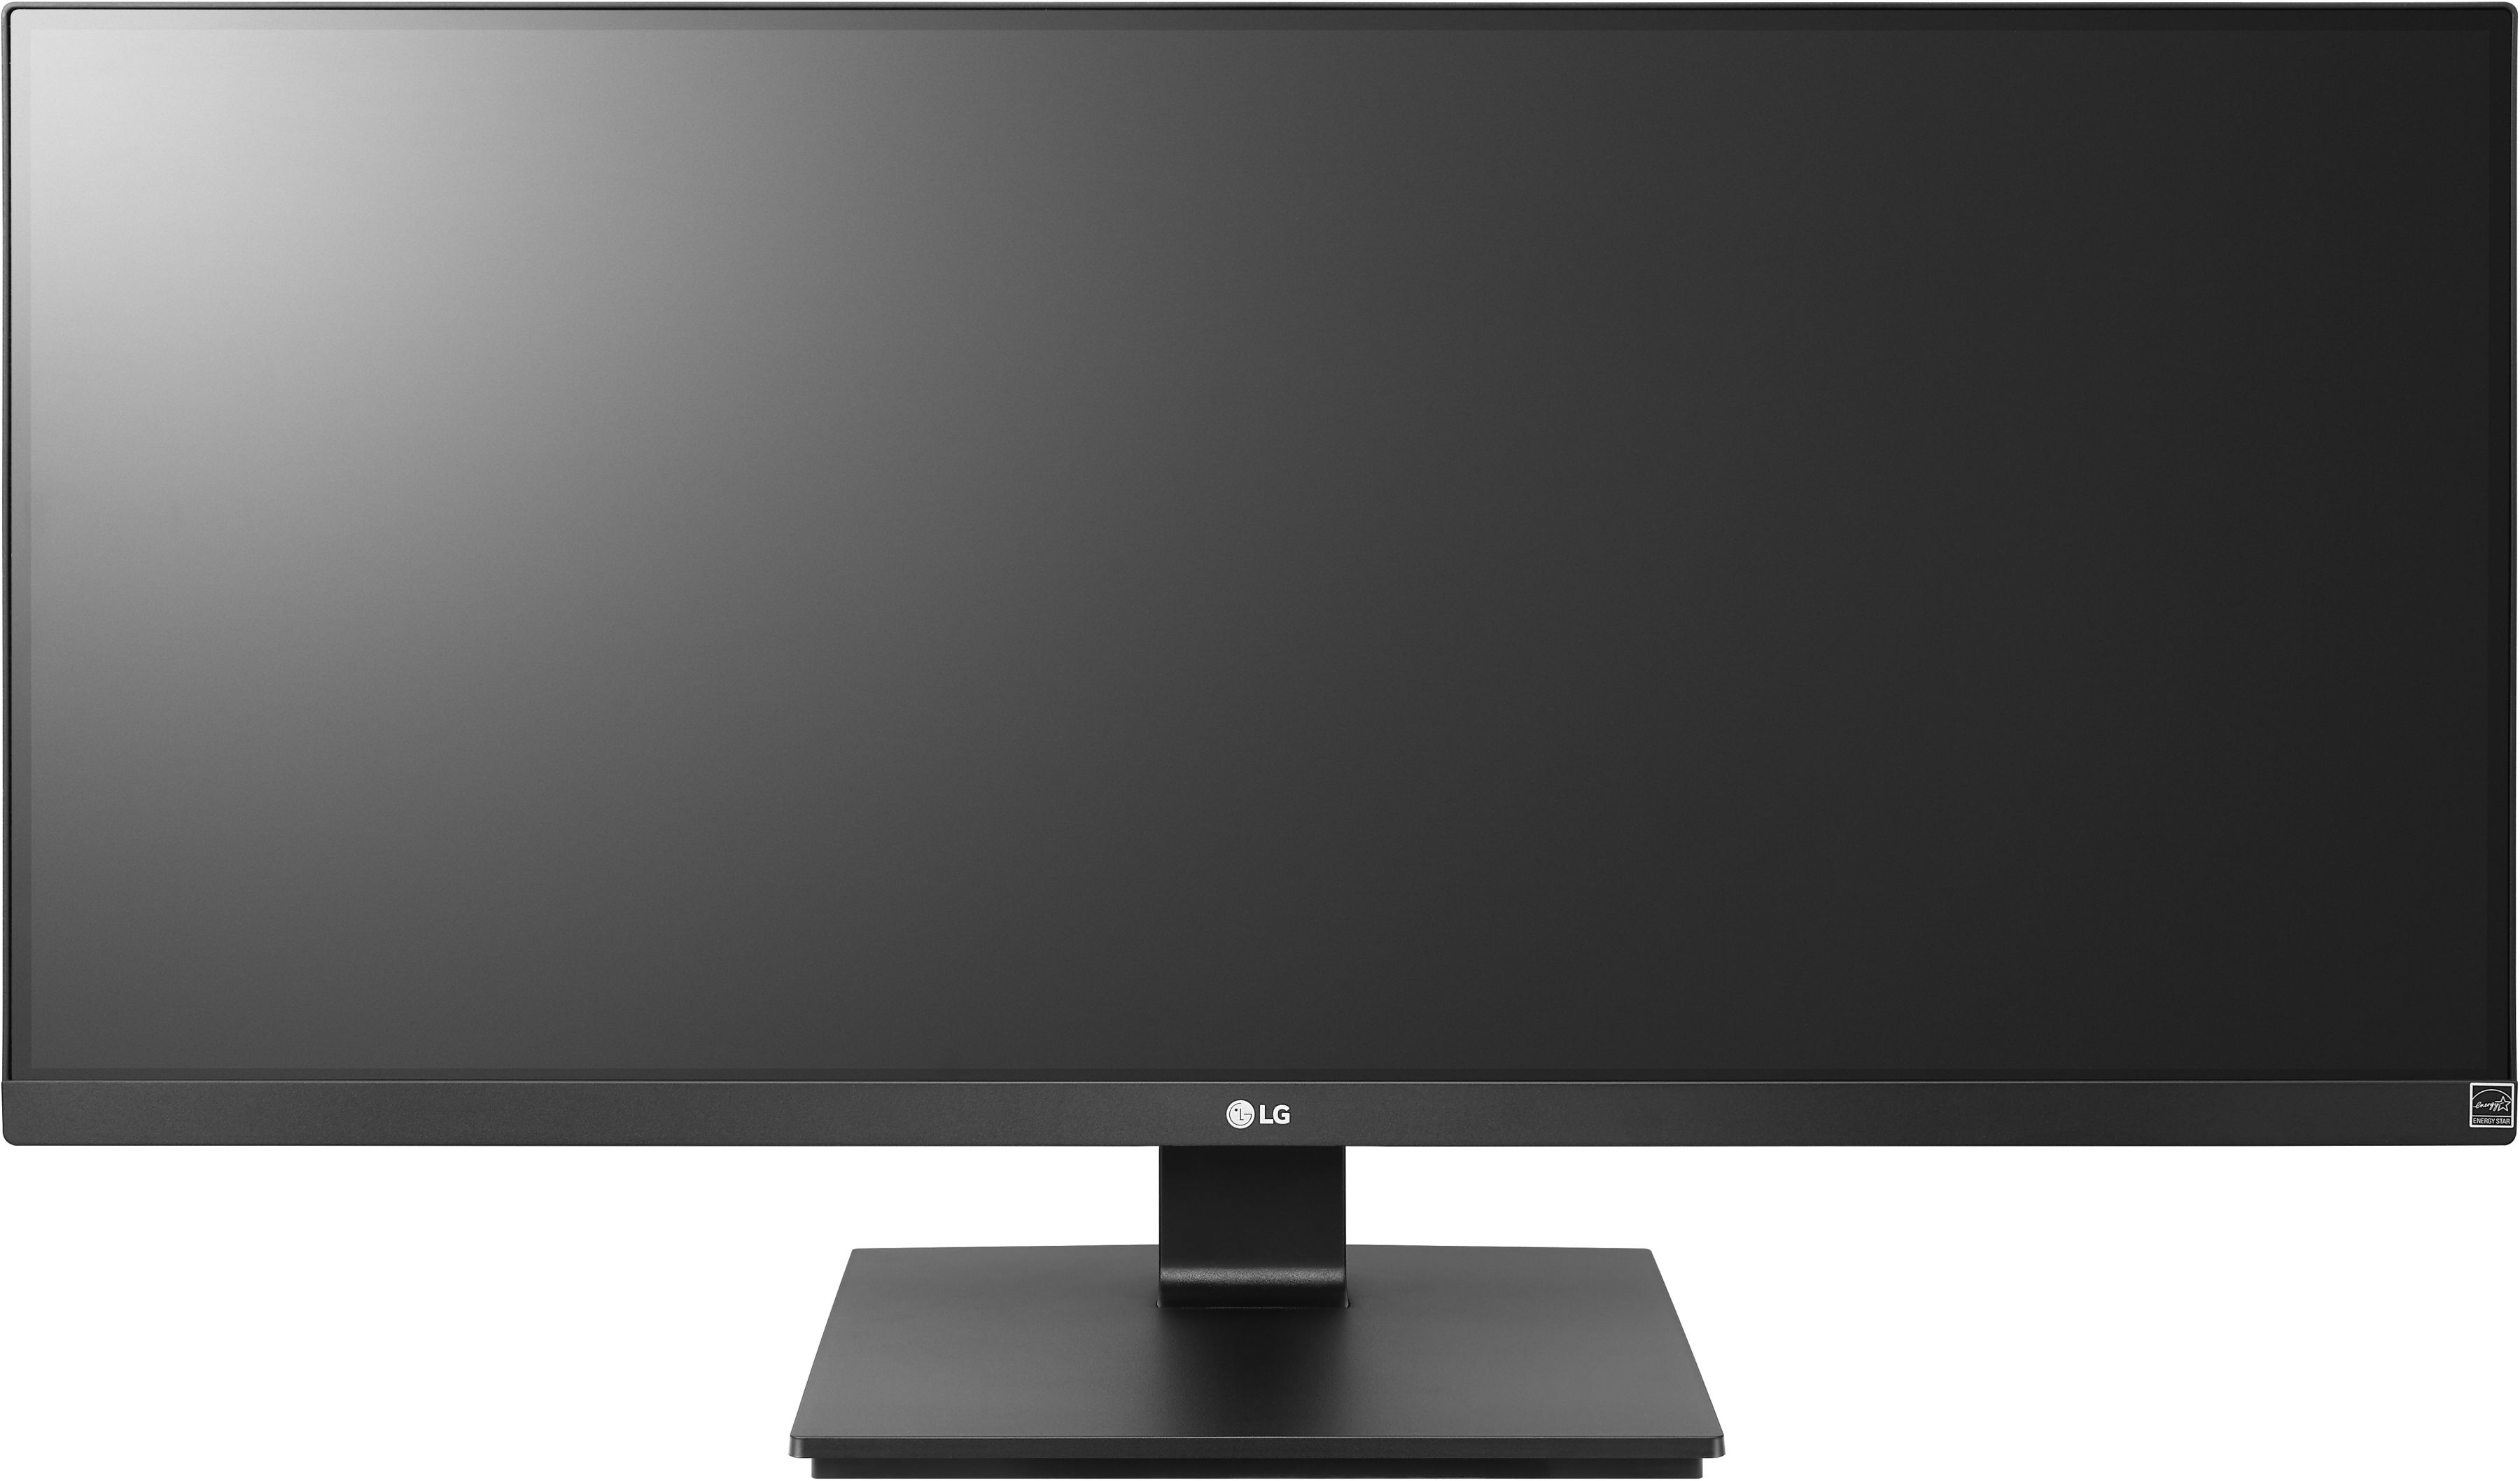 "LG 29BN650-B monitor komputerowy 73,7 cm (29"") 2560 x 1080 px"